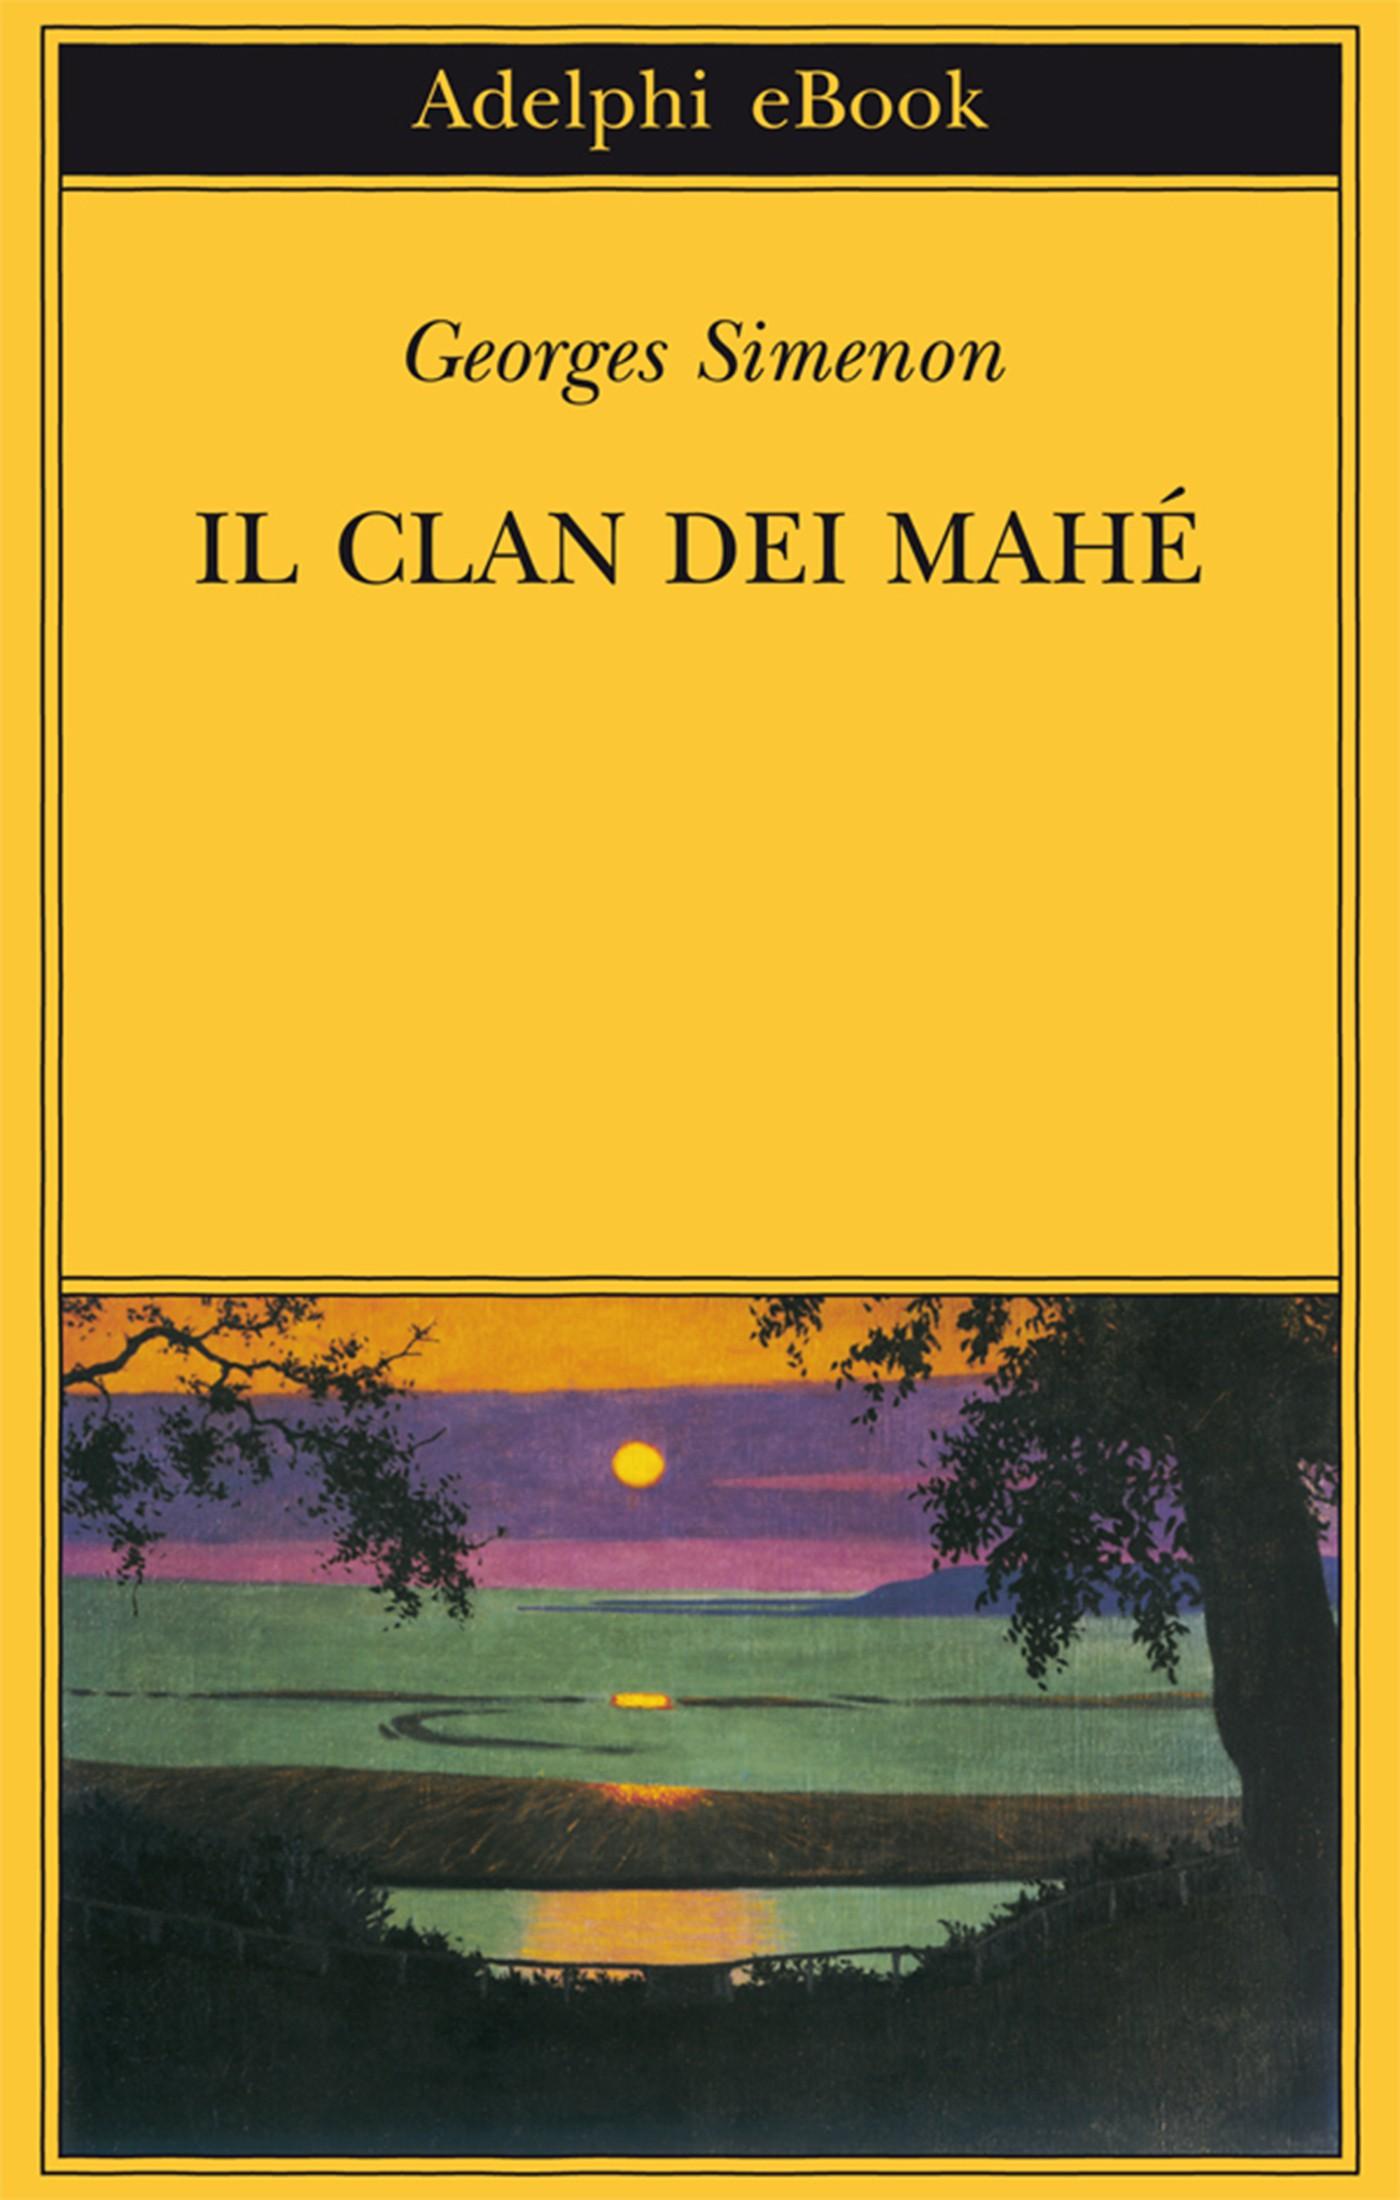 Georges Simenon, Il clan dei Mahé, Adelphi